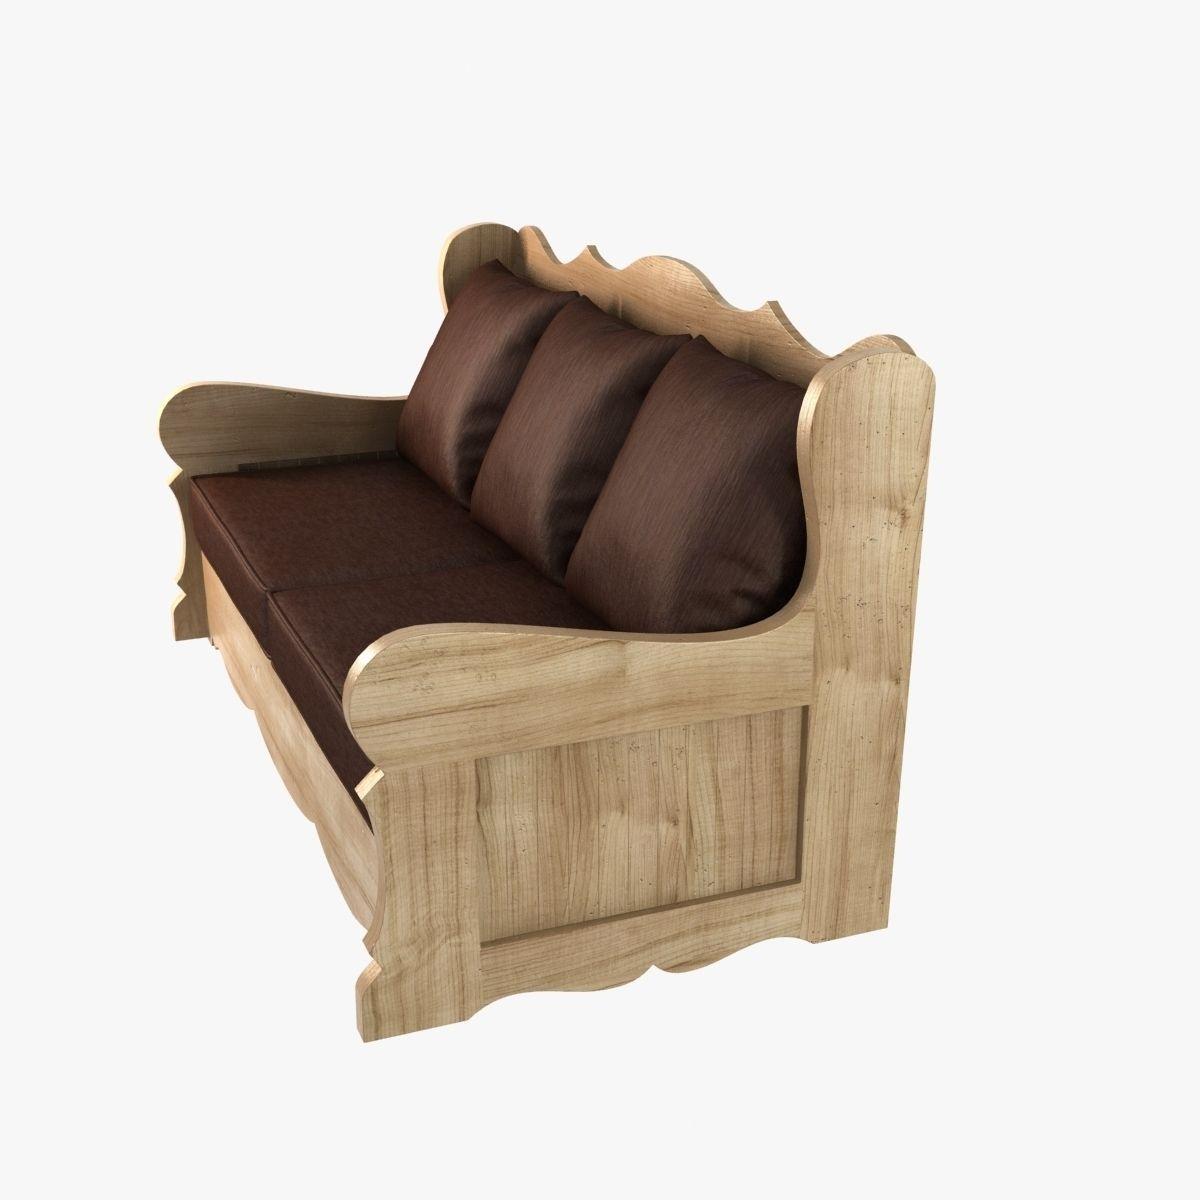 Wood Sofa Provence Village Style 3d Model Max Obj 3ds Fbx